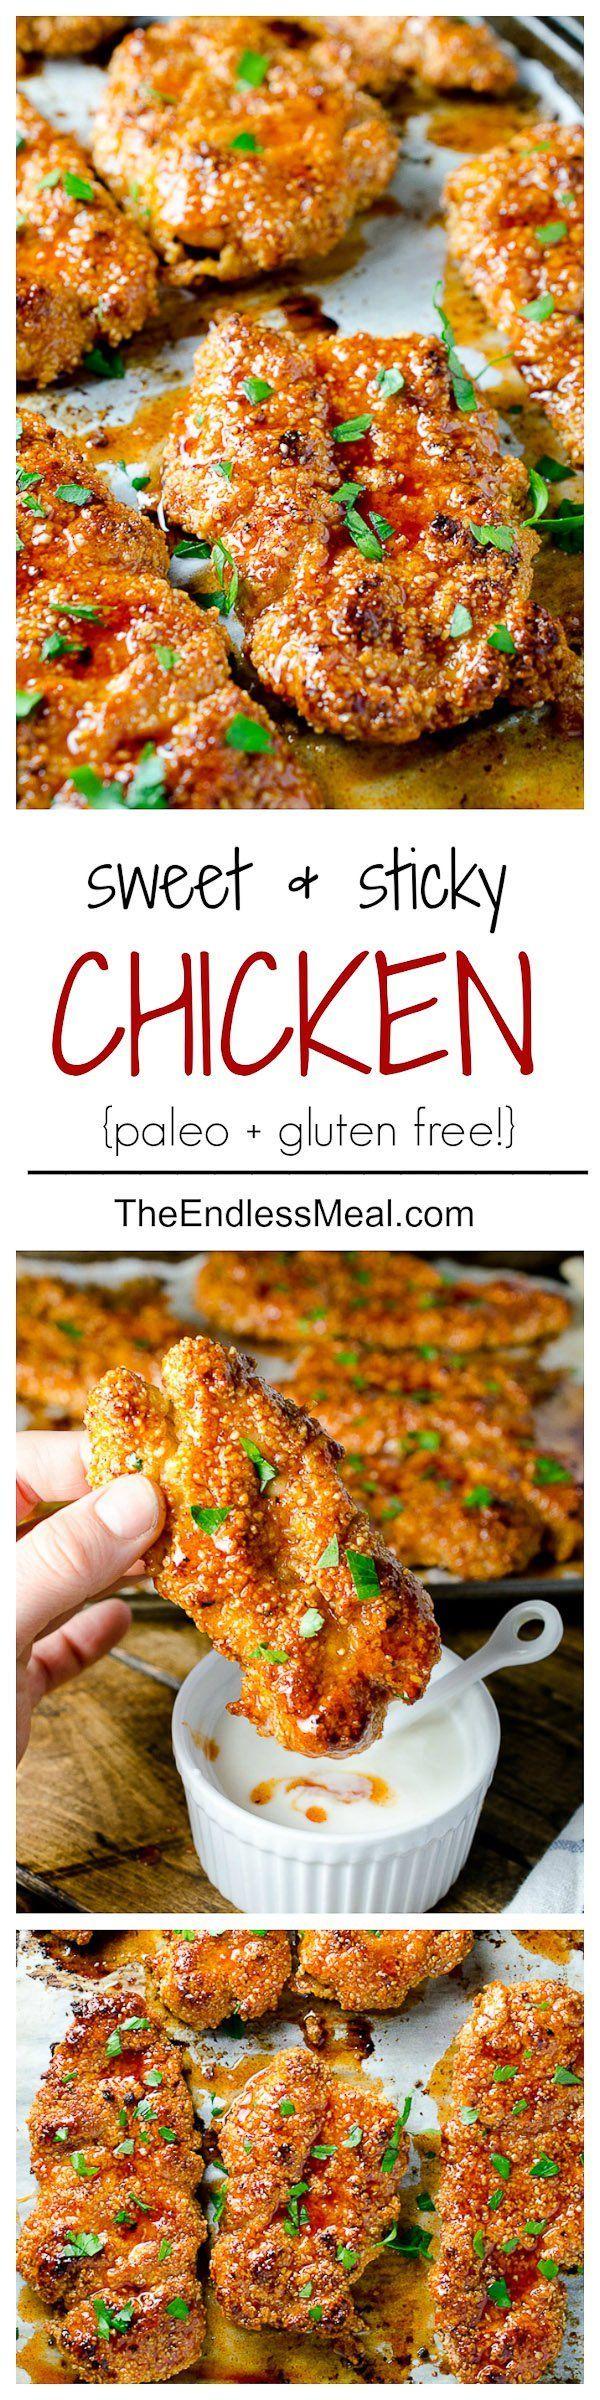 Sweet and Spicy Paleo Chicken Bites